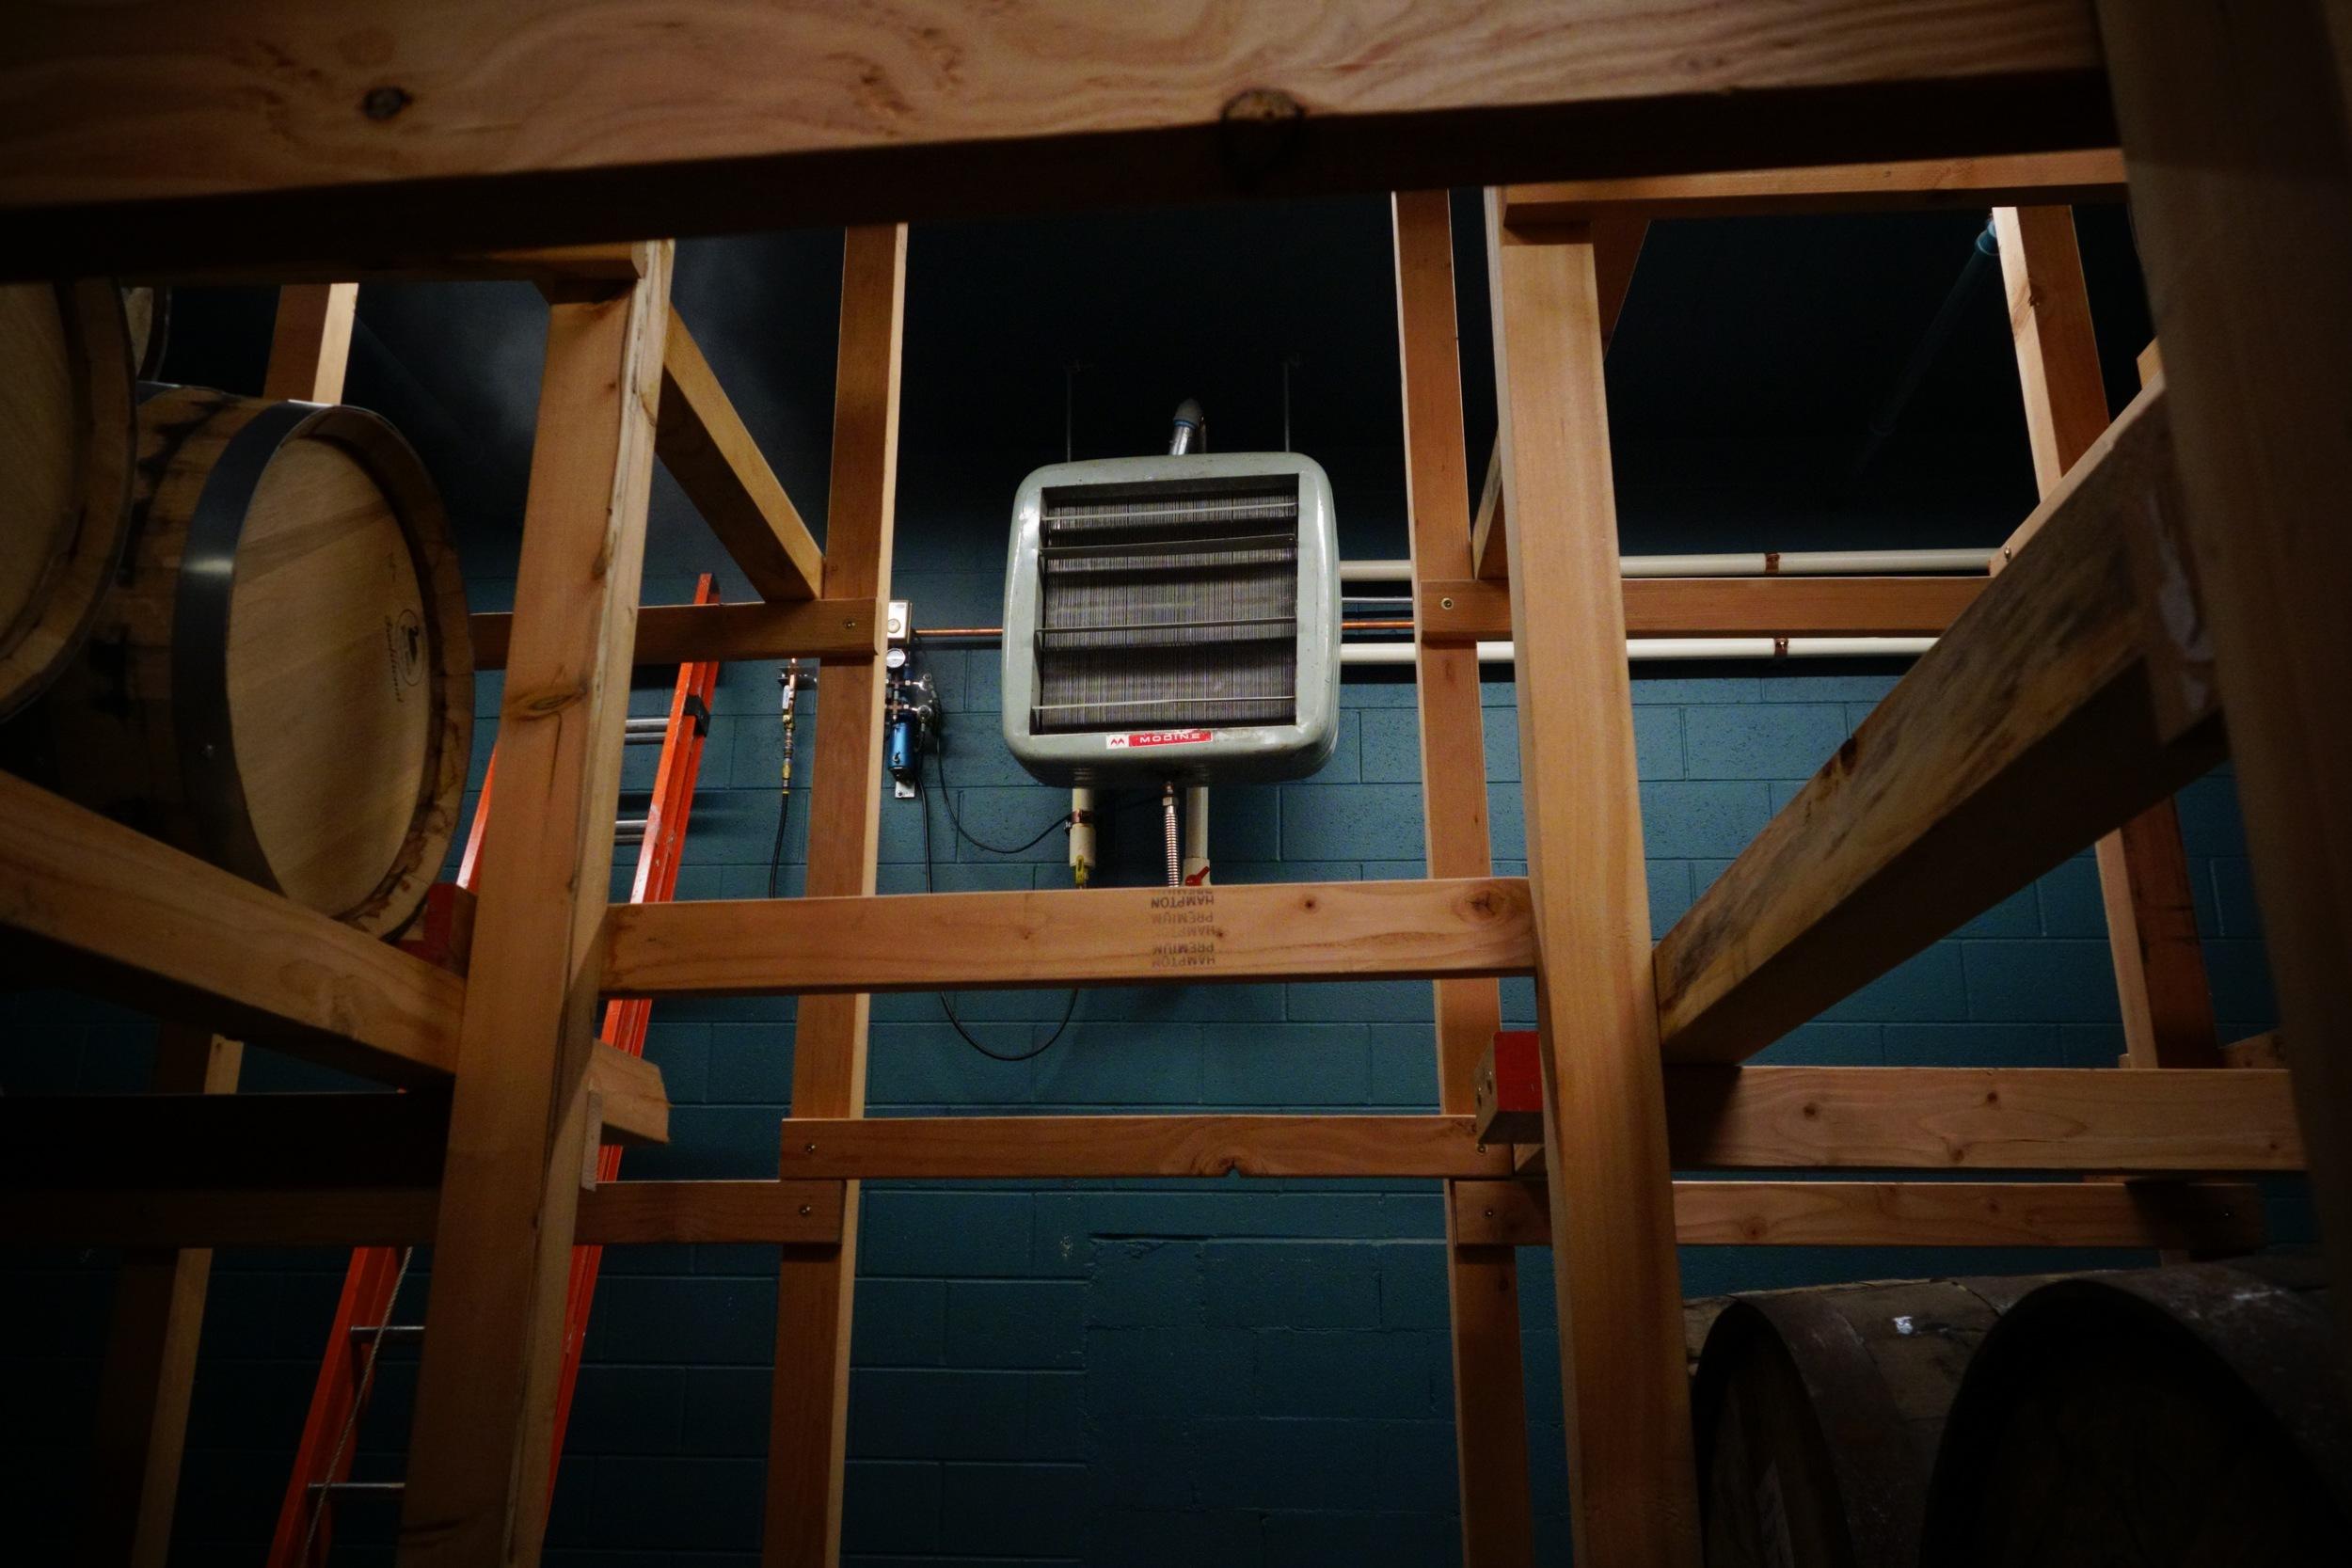 the radiator in the barrel room